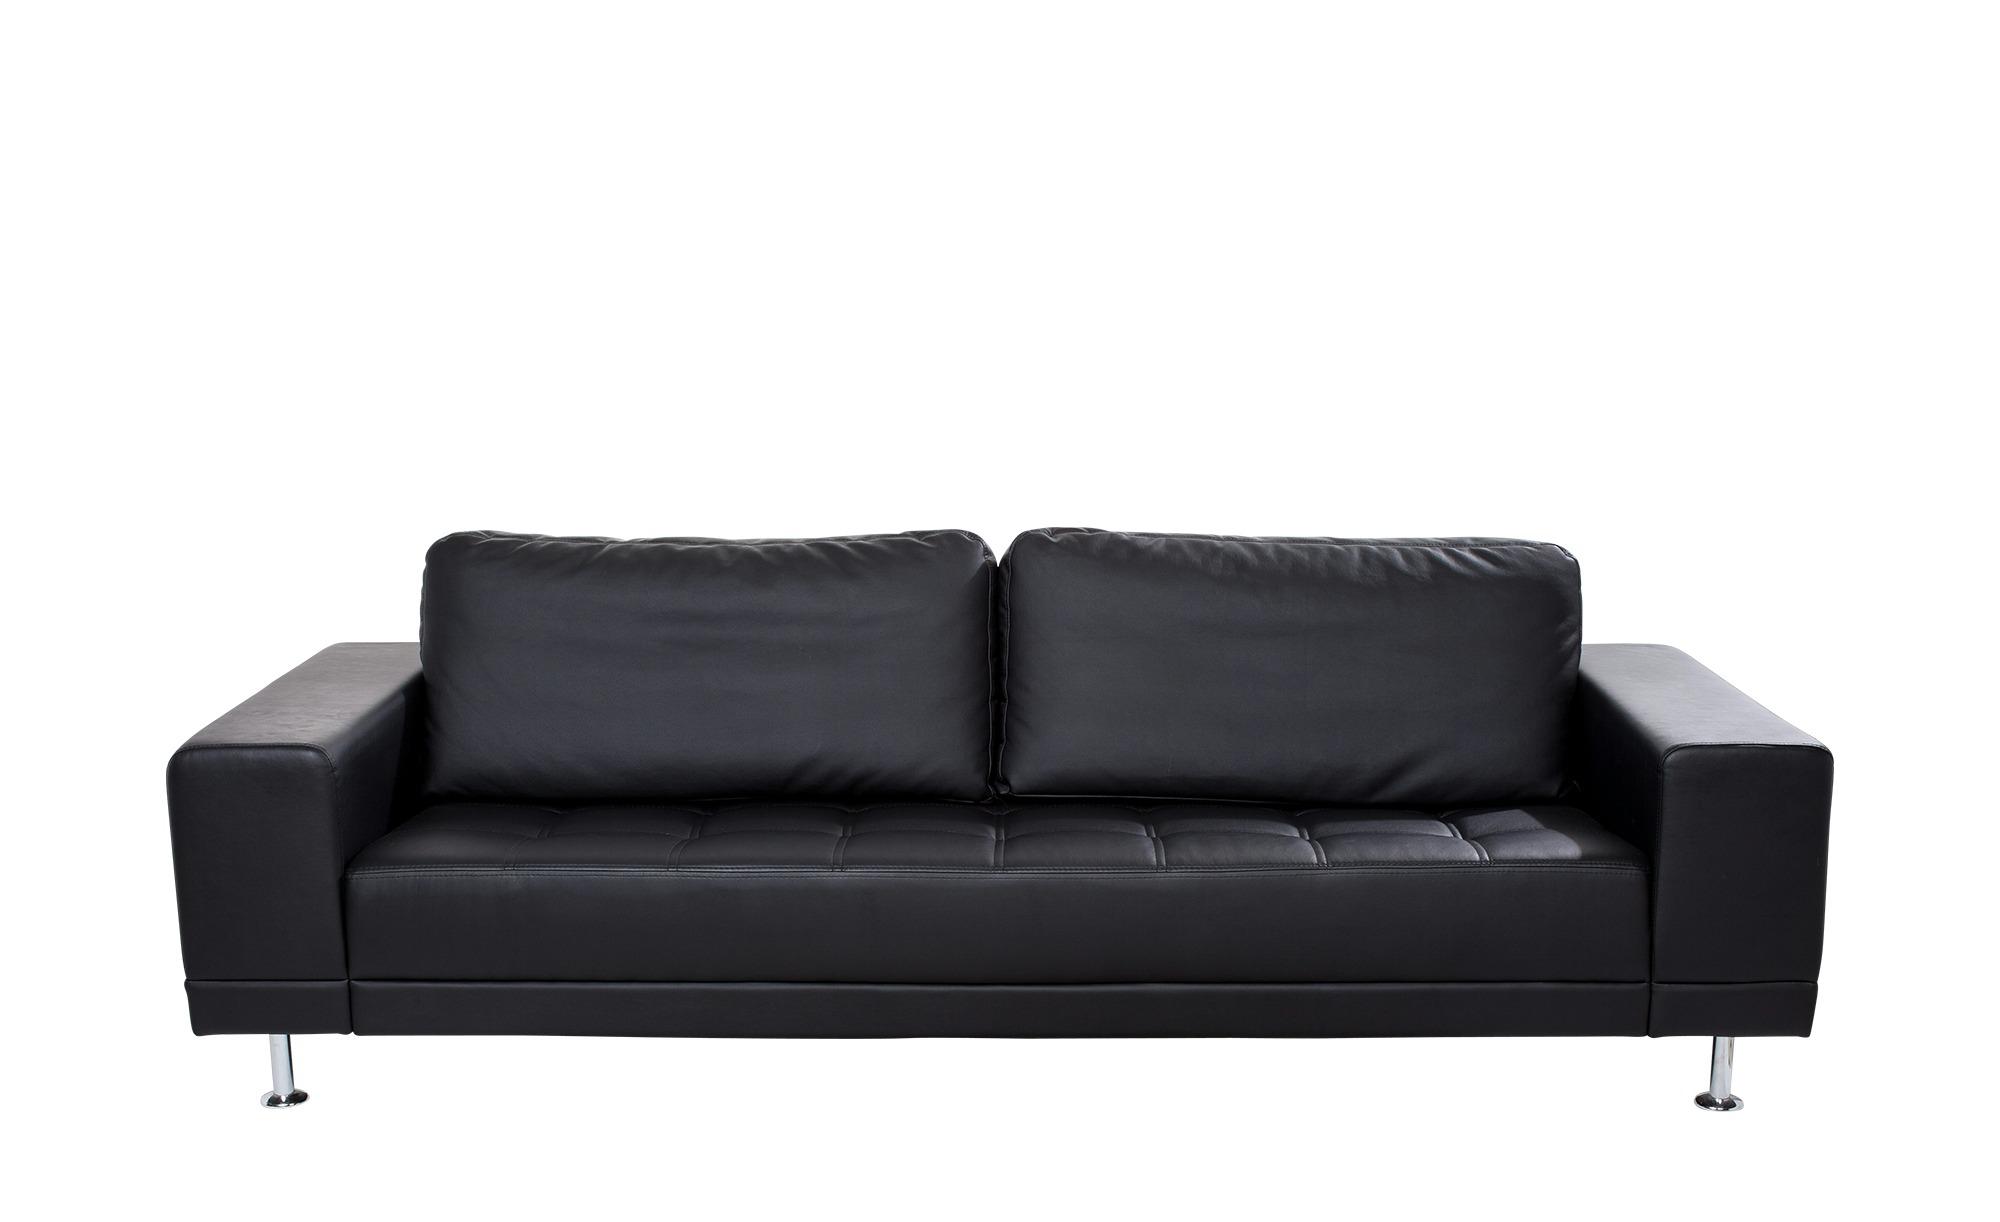 sofa 250cm grey corner sofas uk smart schwarzes design garda breite 250 cm höhe 85